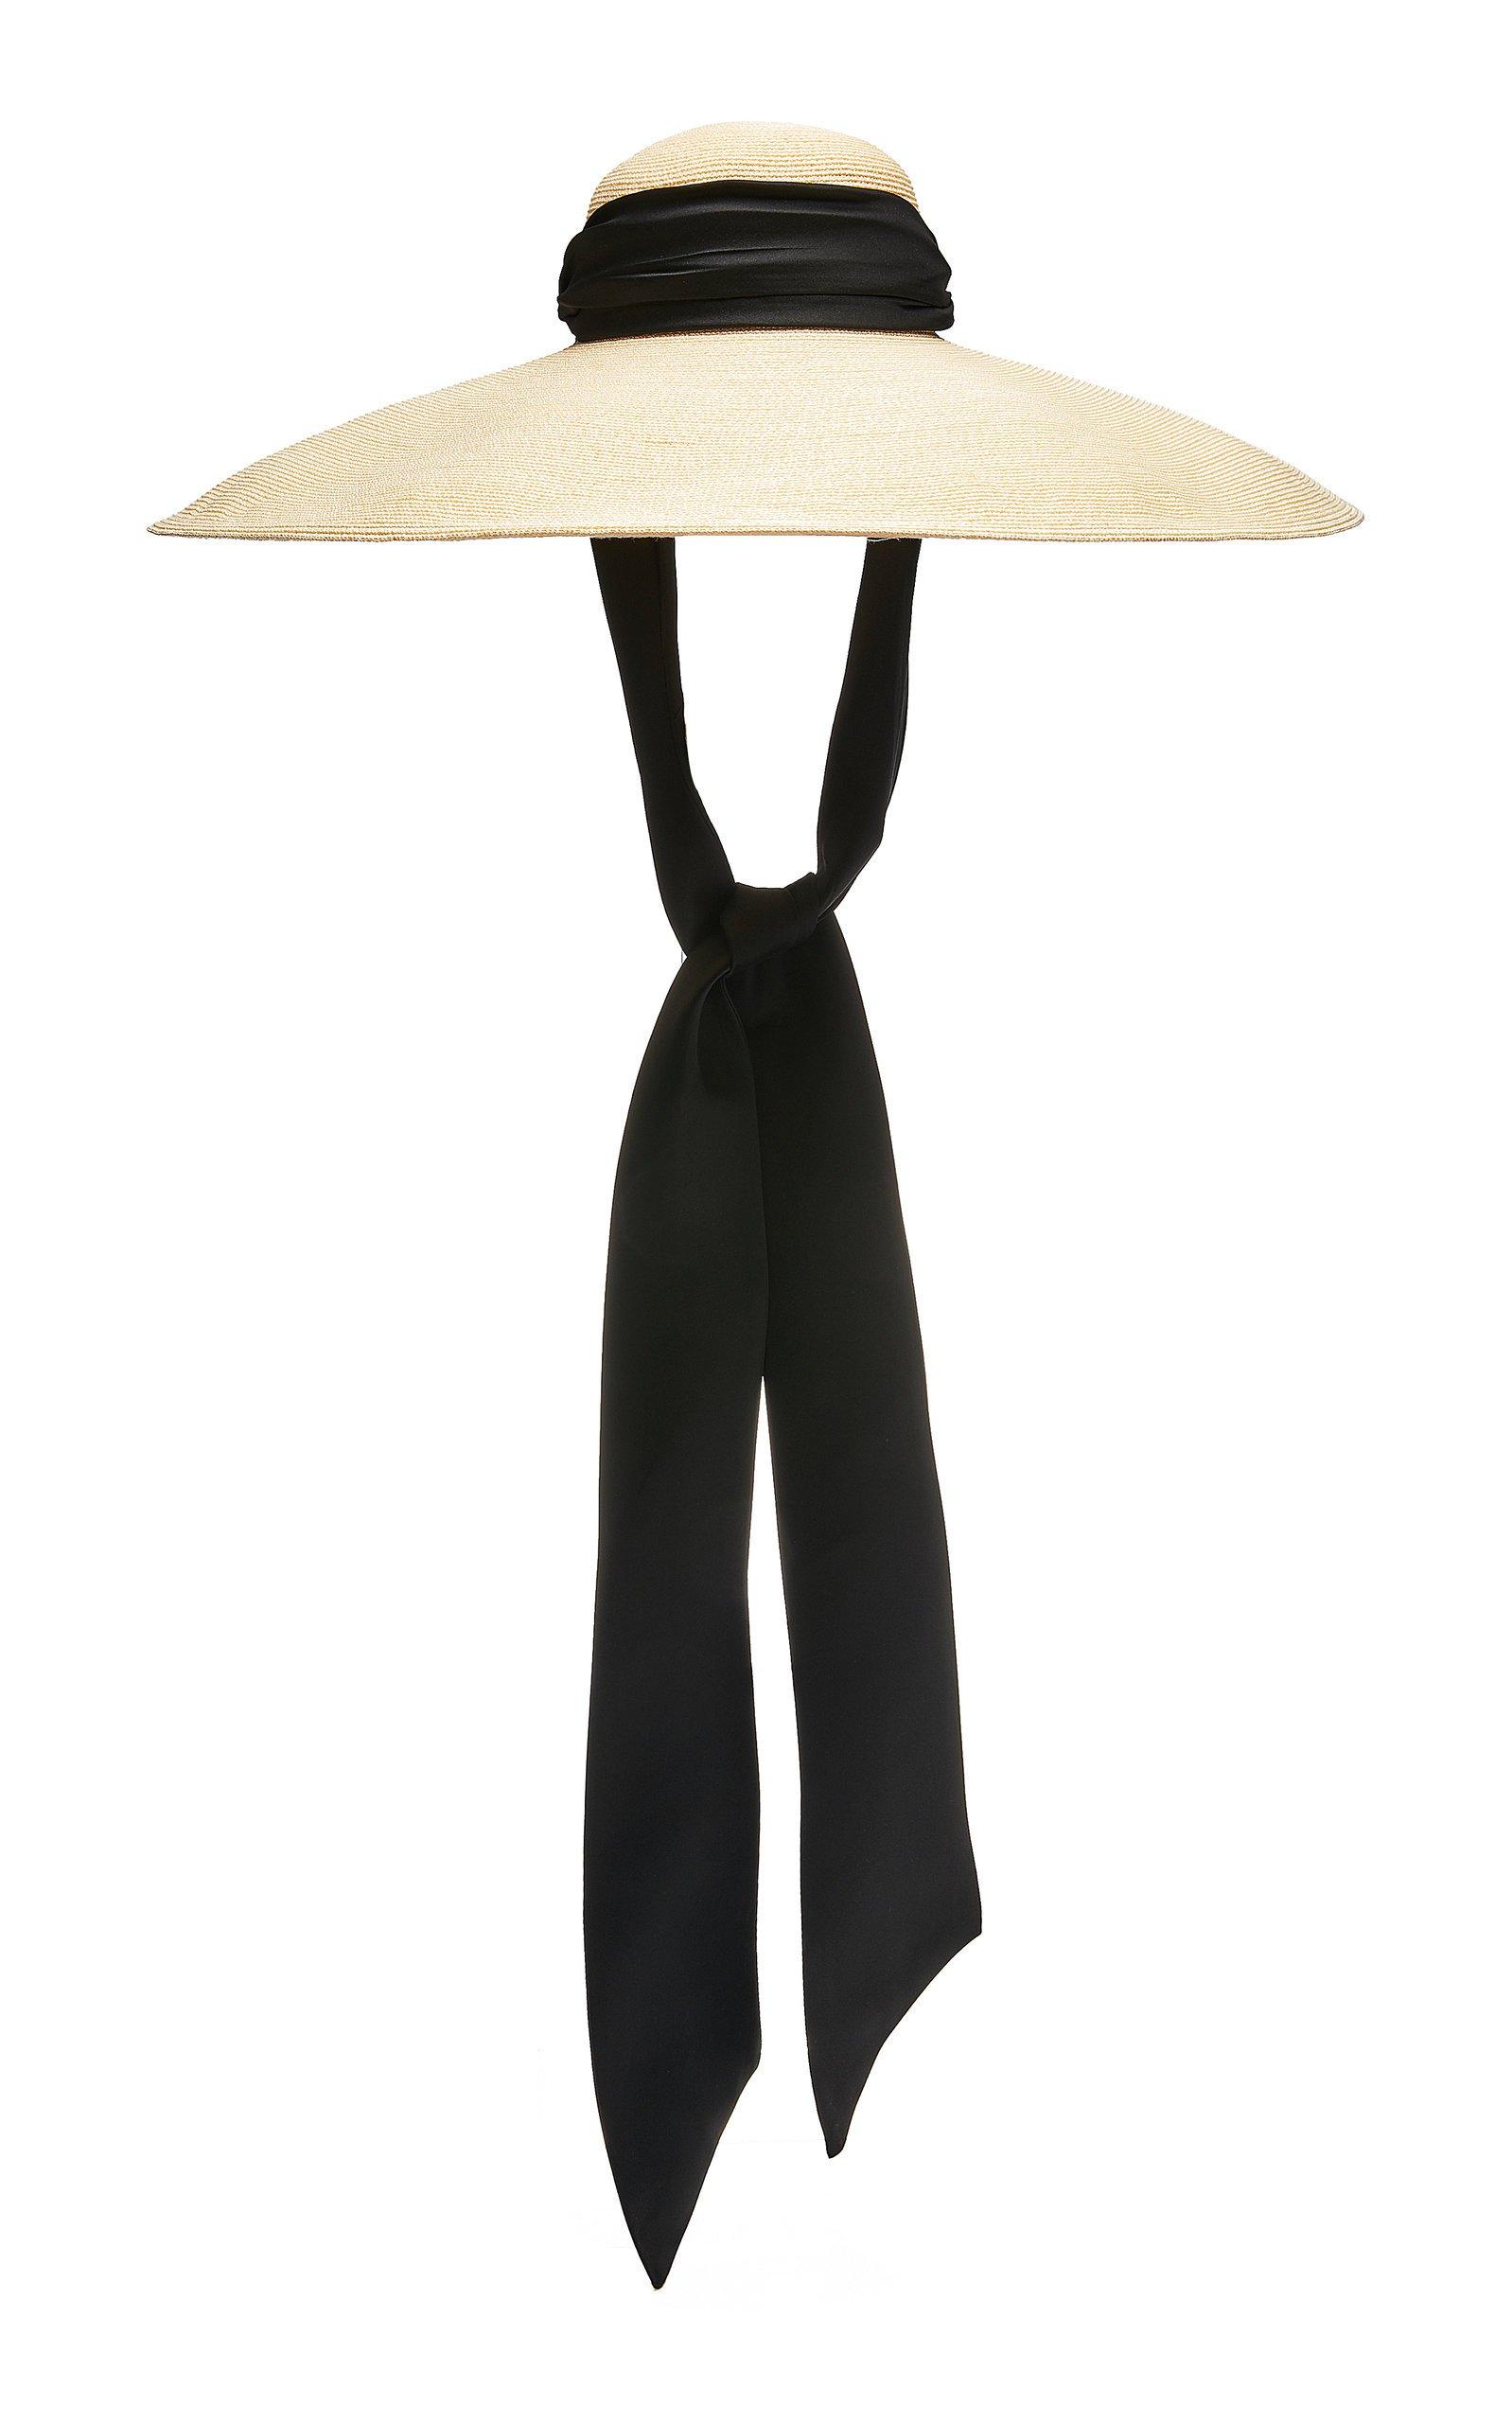 Veruschka Cotton-Trimmed Straw Hat by Eugenia Kim | Moda Operandi